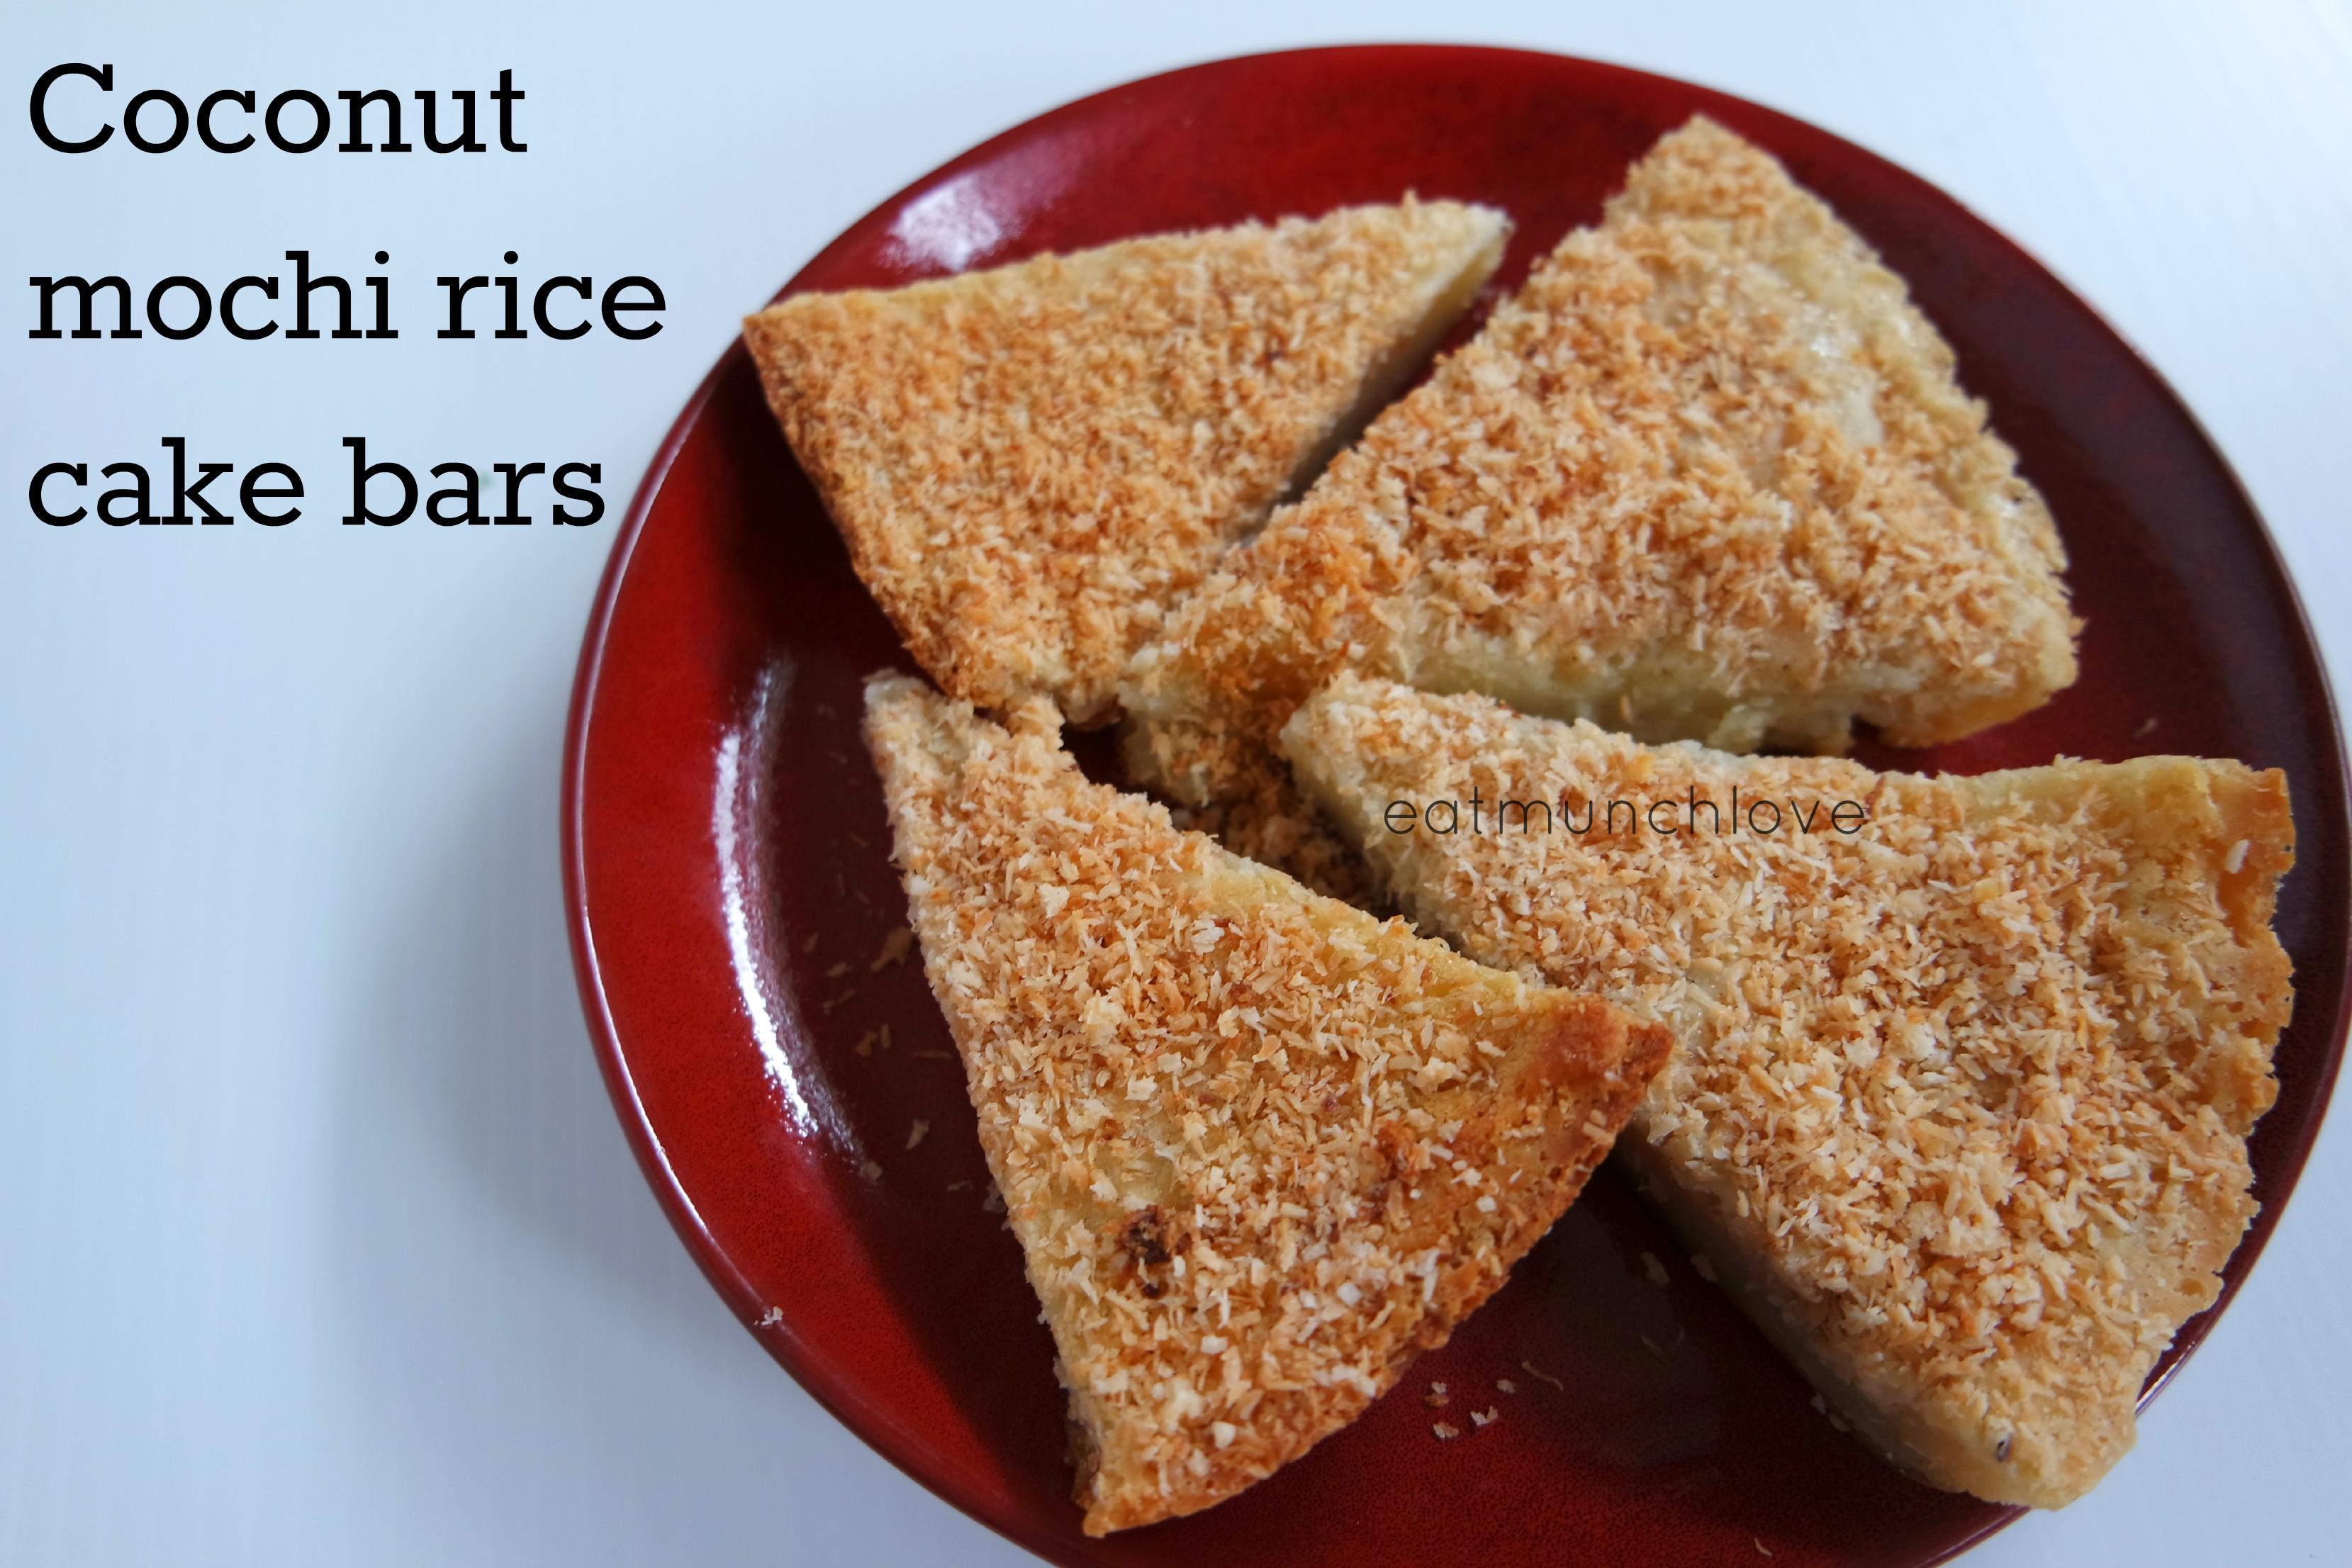 Baked Coconut Mochi Rice Cake Gluten Free Eatmunchlove